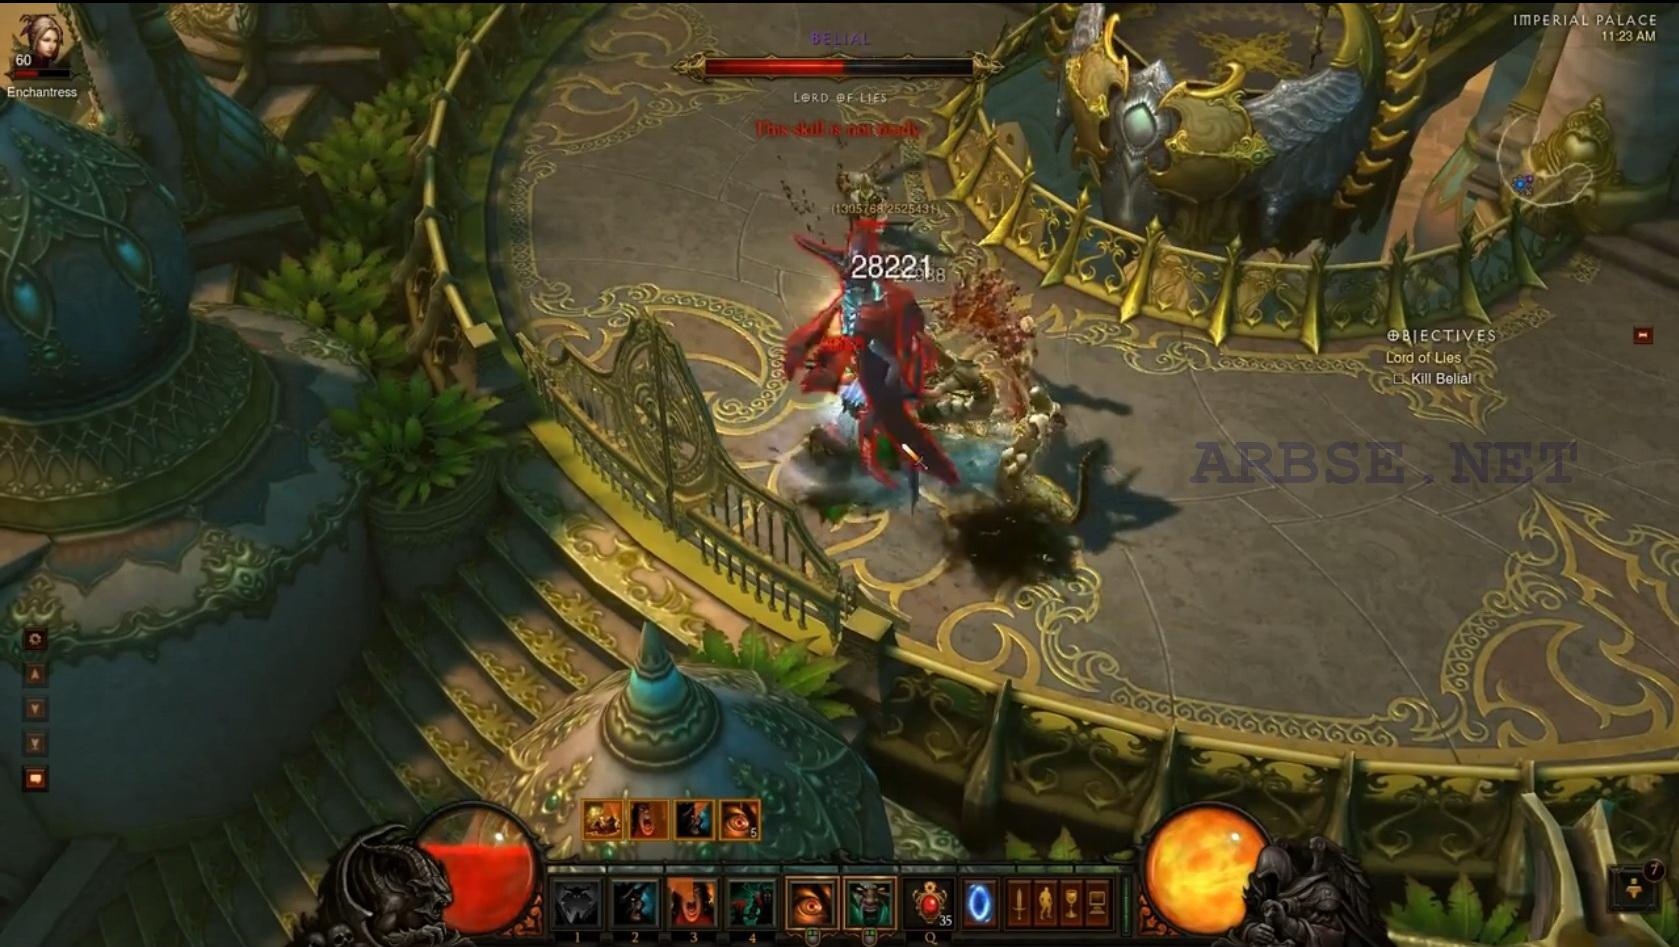 Diablo 3 Репак Торрент